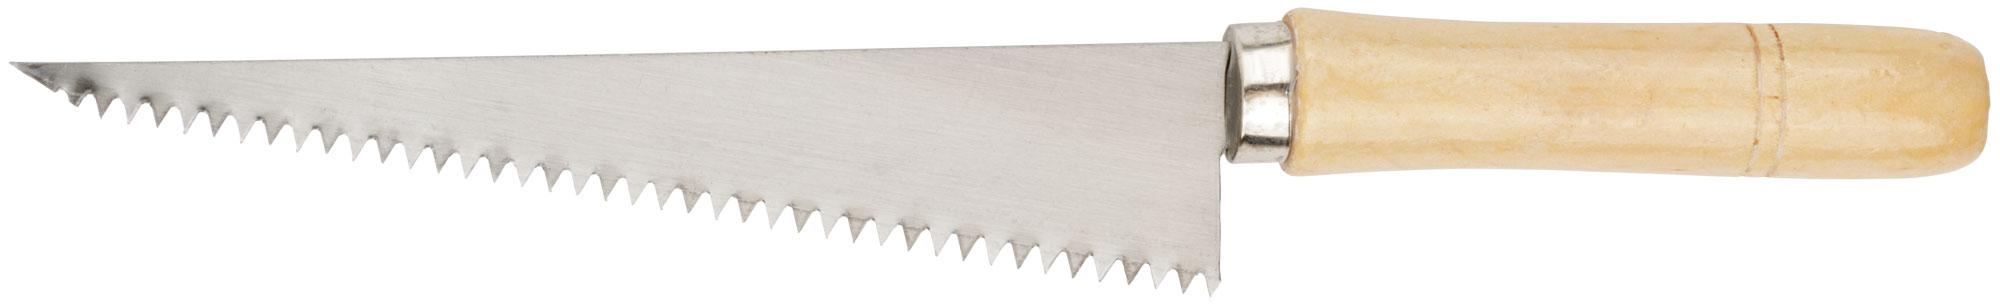 Ножовка по гипсокартону Fit 15375